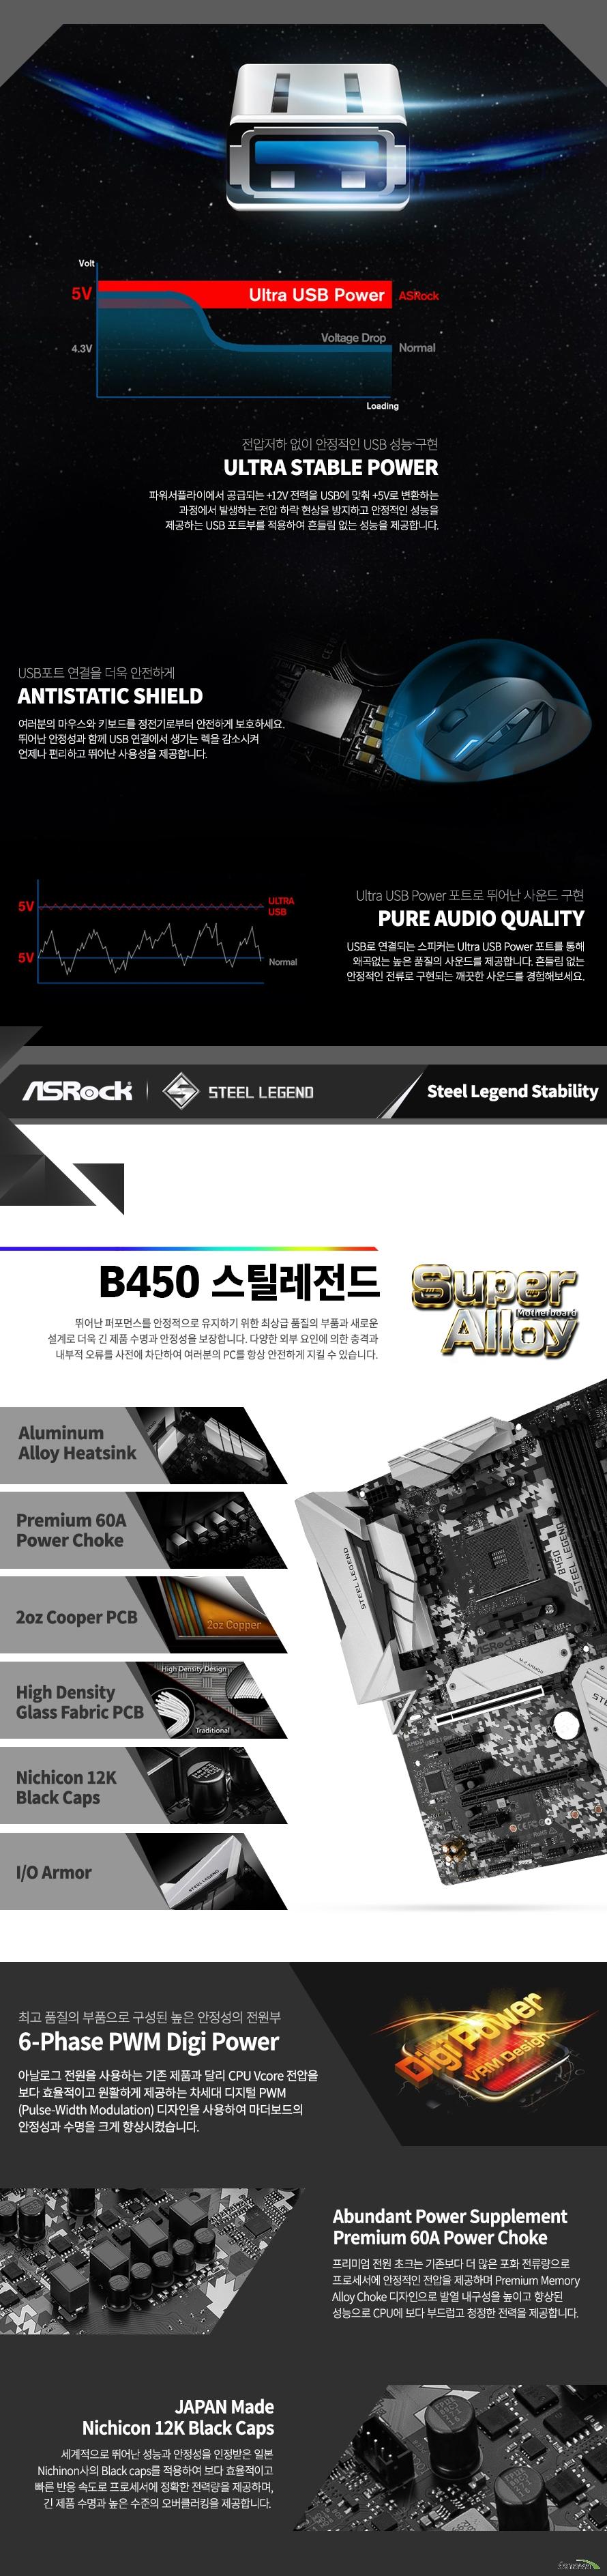 ASRock B450 스틸레전드 에즈윈